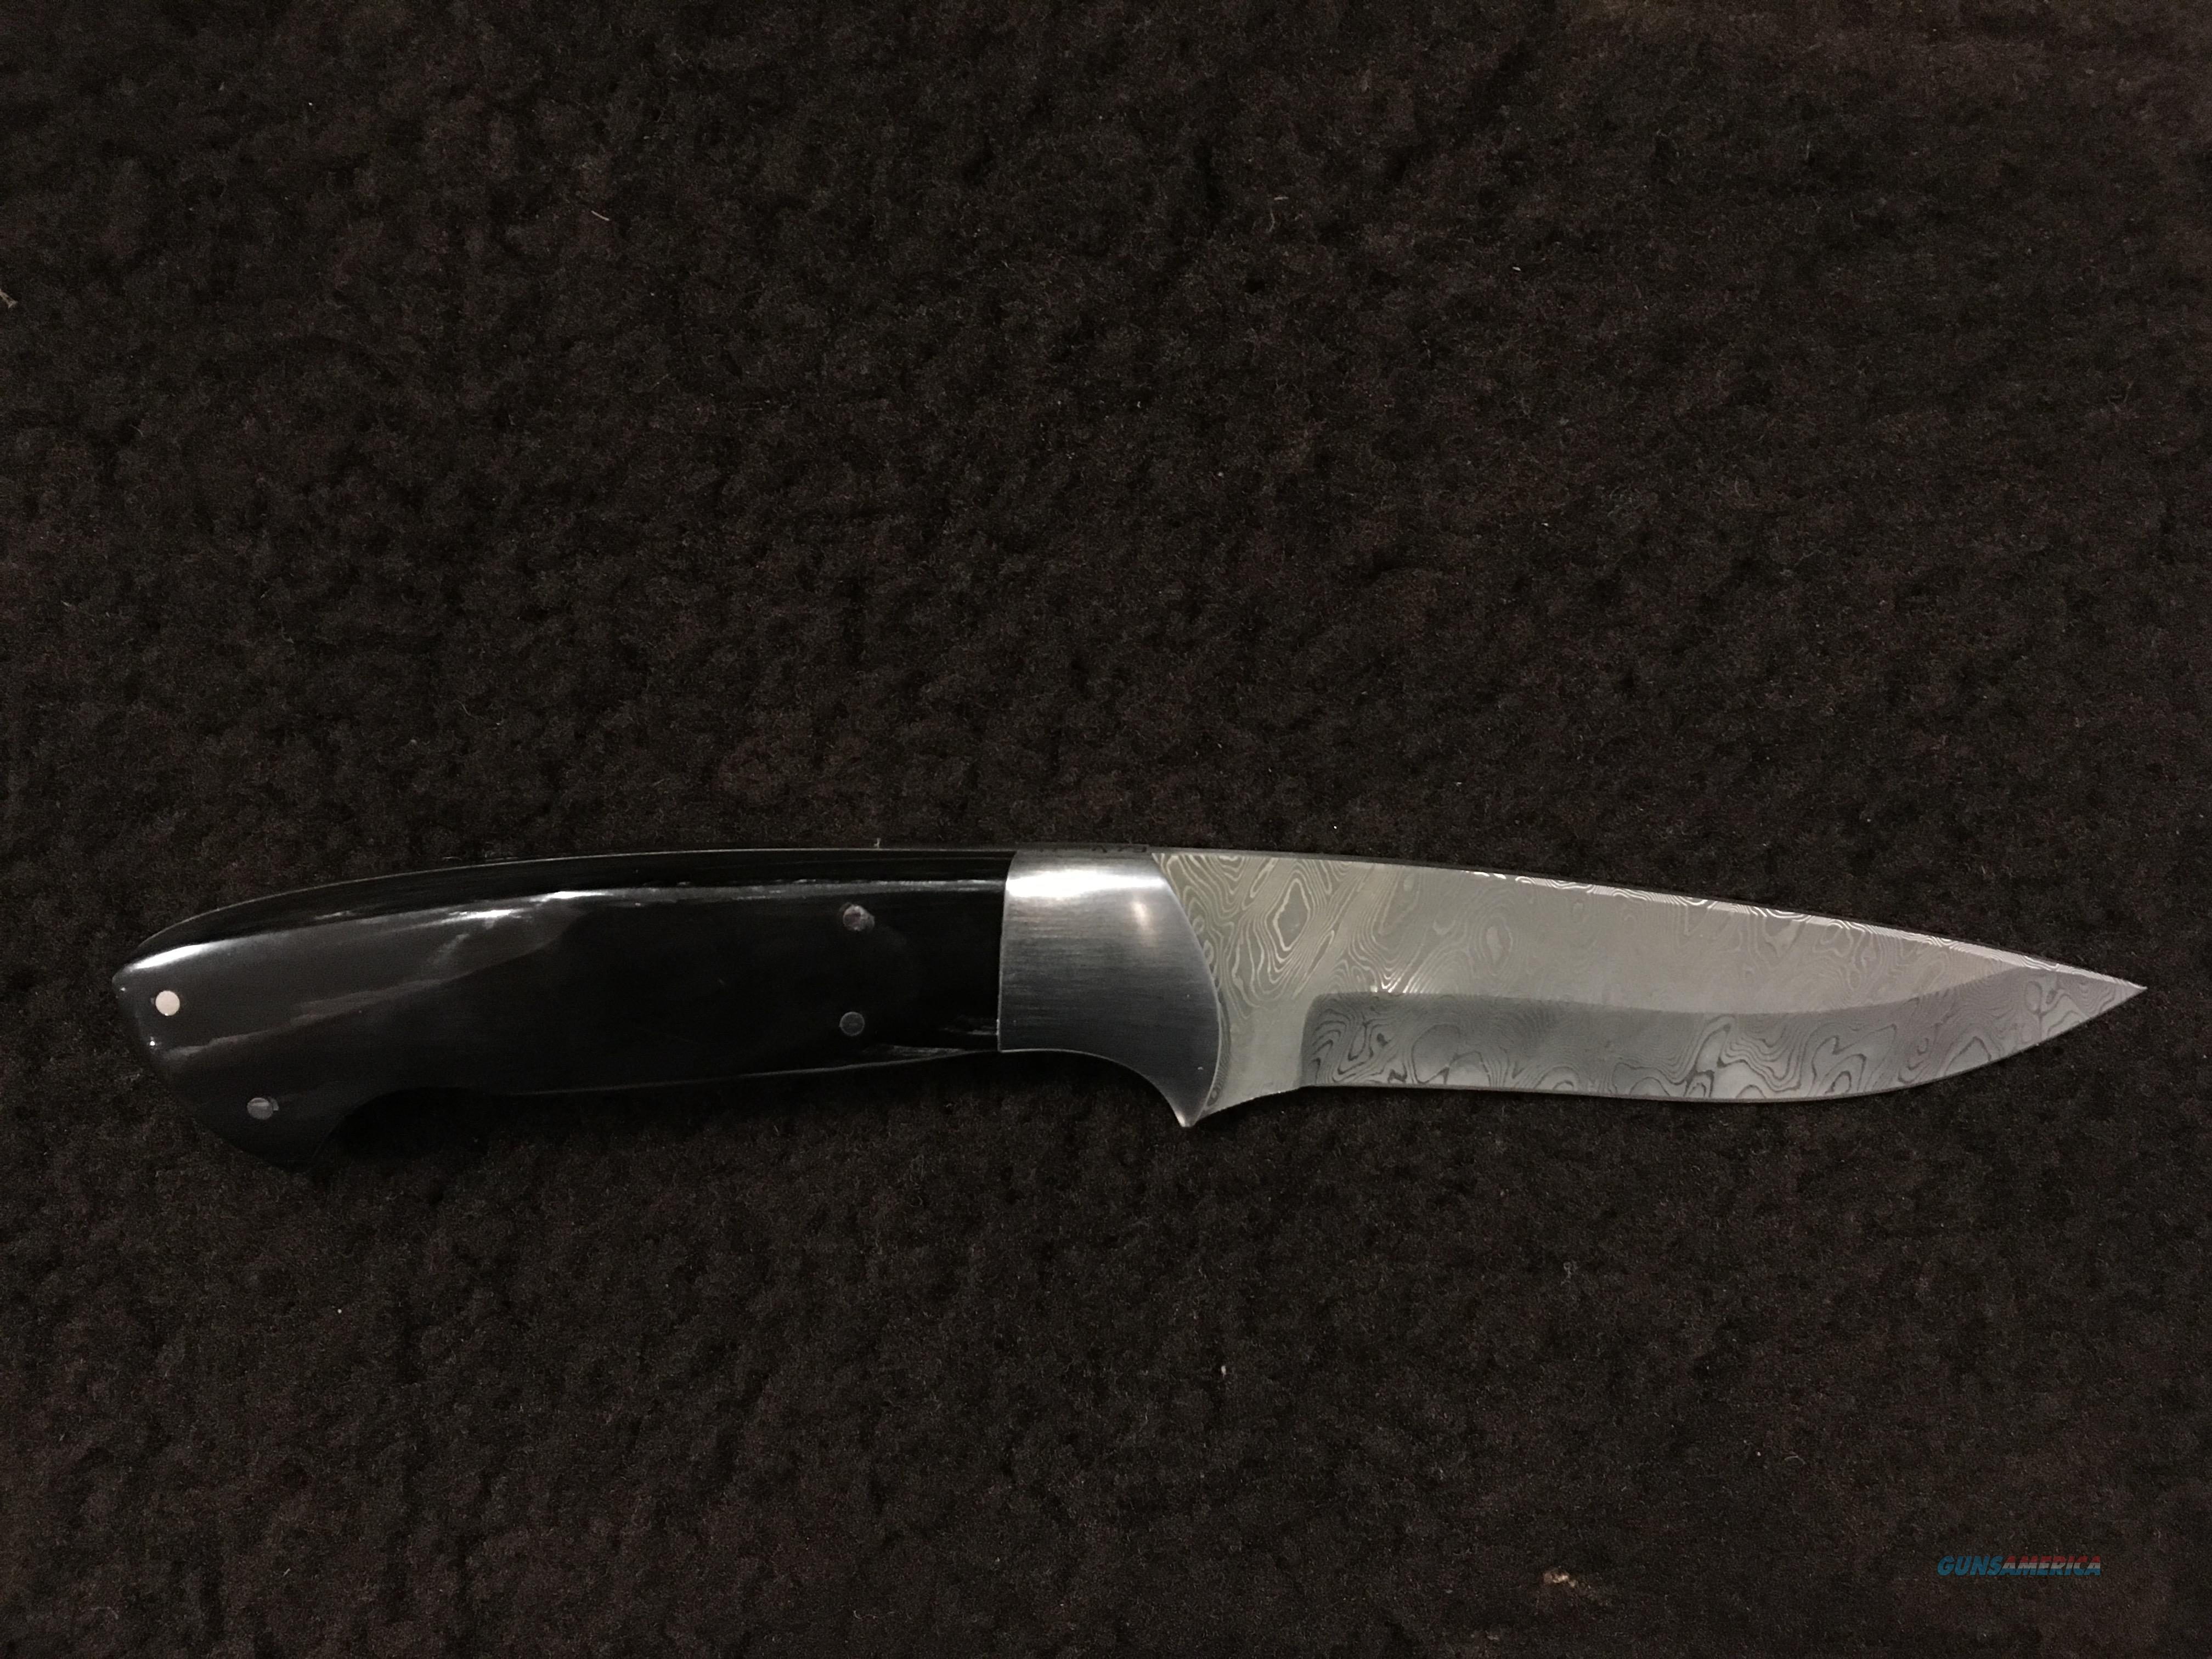 Serengeti Hunter Stainless Steel Damascus Knife  Non-Guns > Knives/Swords > Knives > Fixed Blade > Hand Made